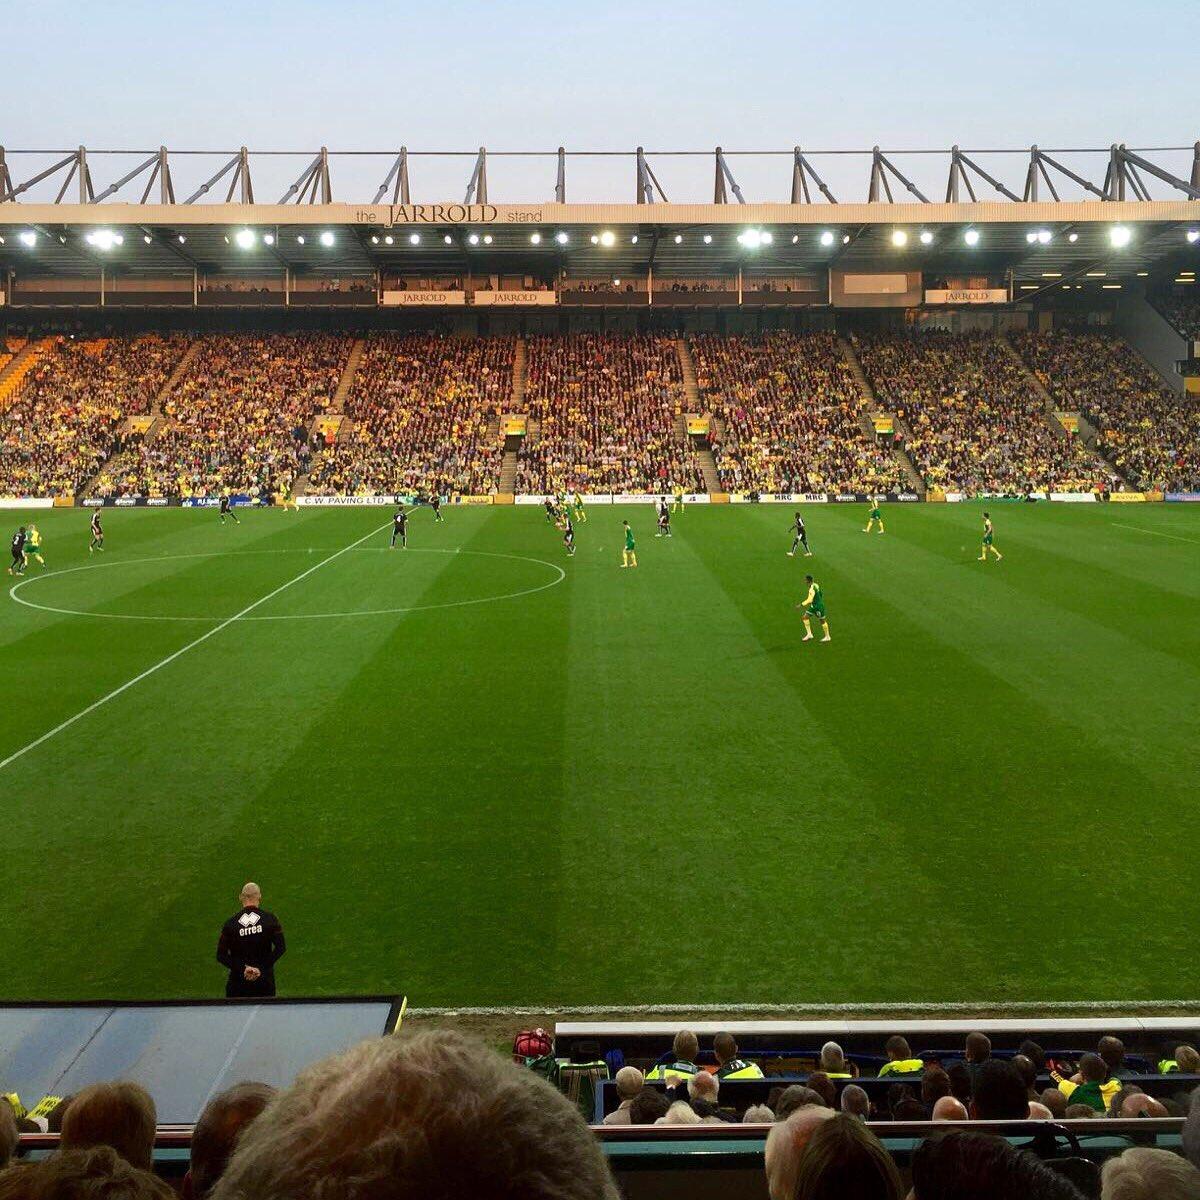 Lovely night at @NorwichCityFC v @WatfordFC ☀️ #ViolaFC https://t.co/r5LEeAkeyB